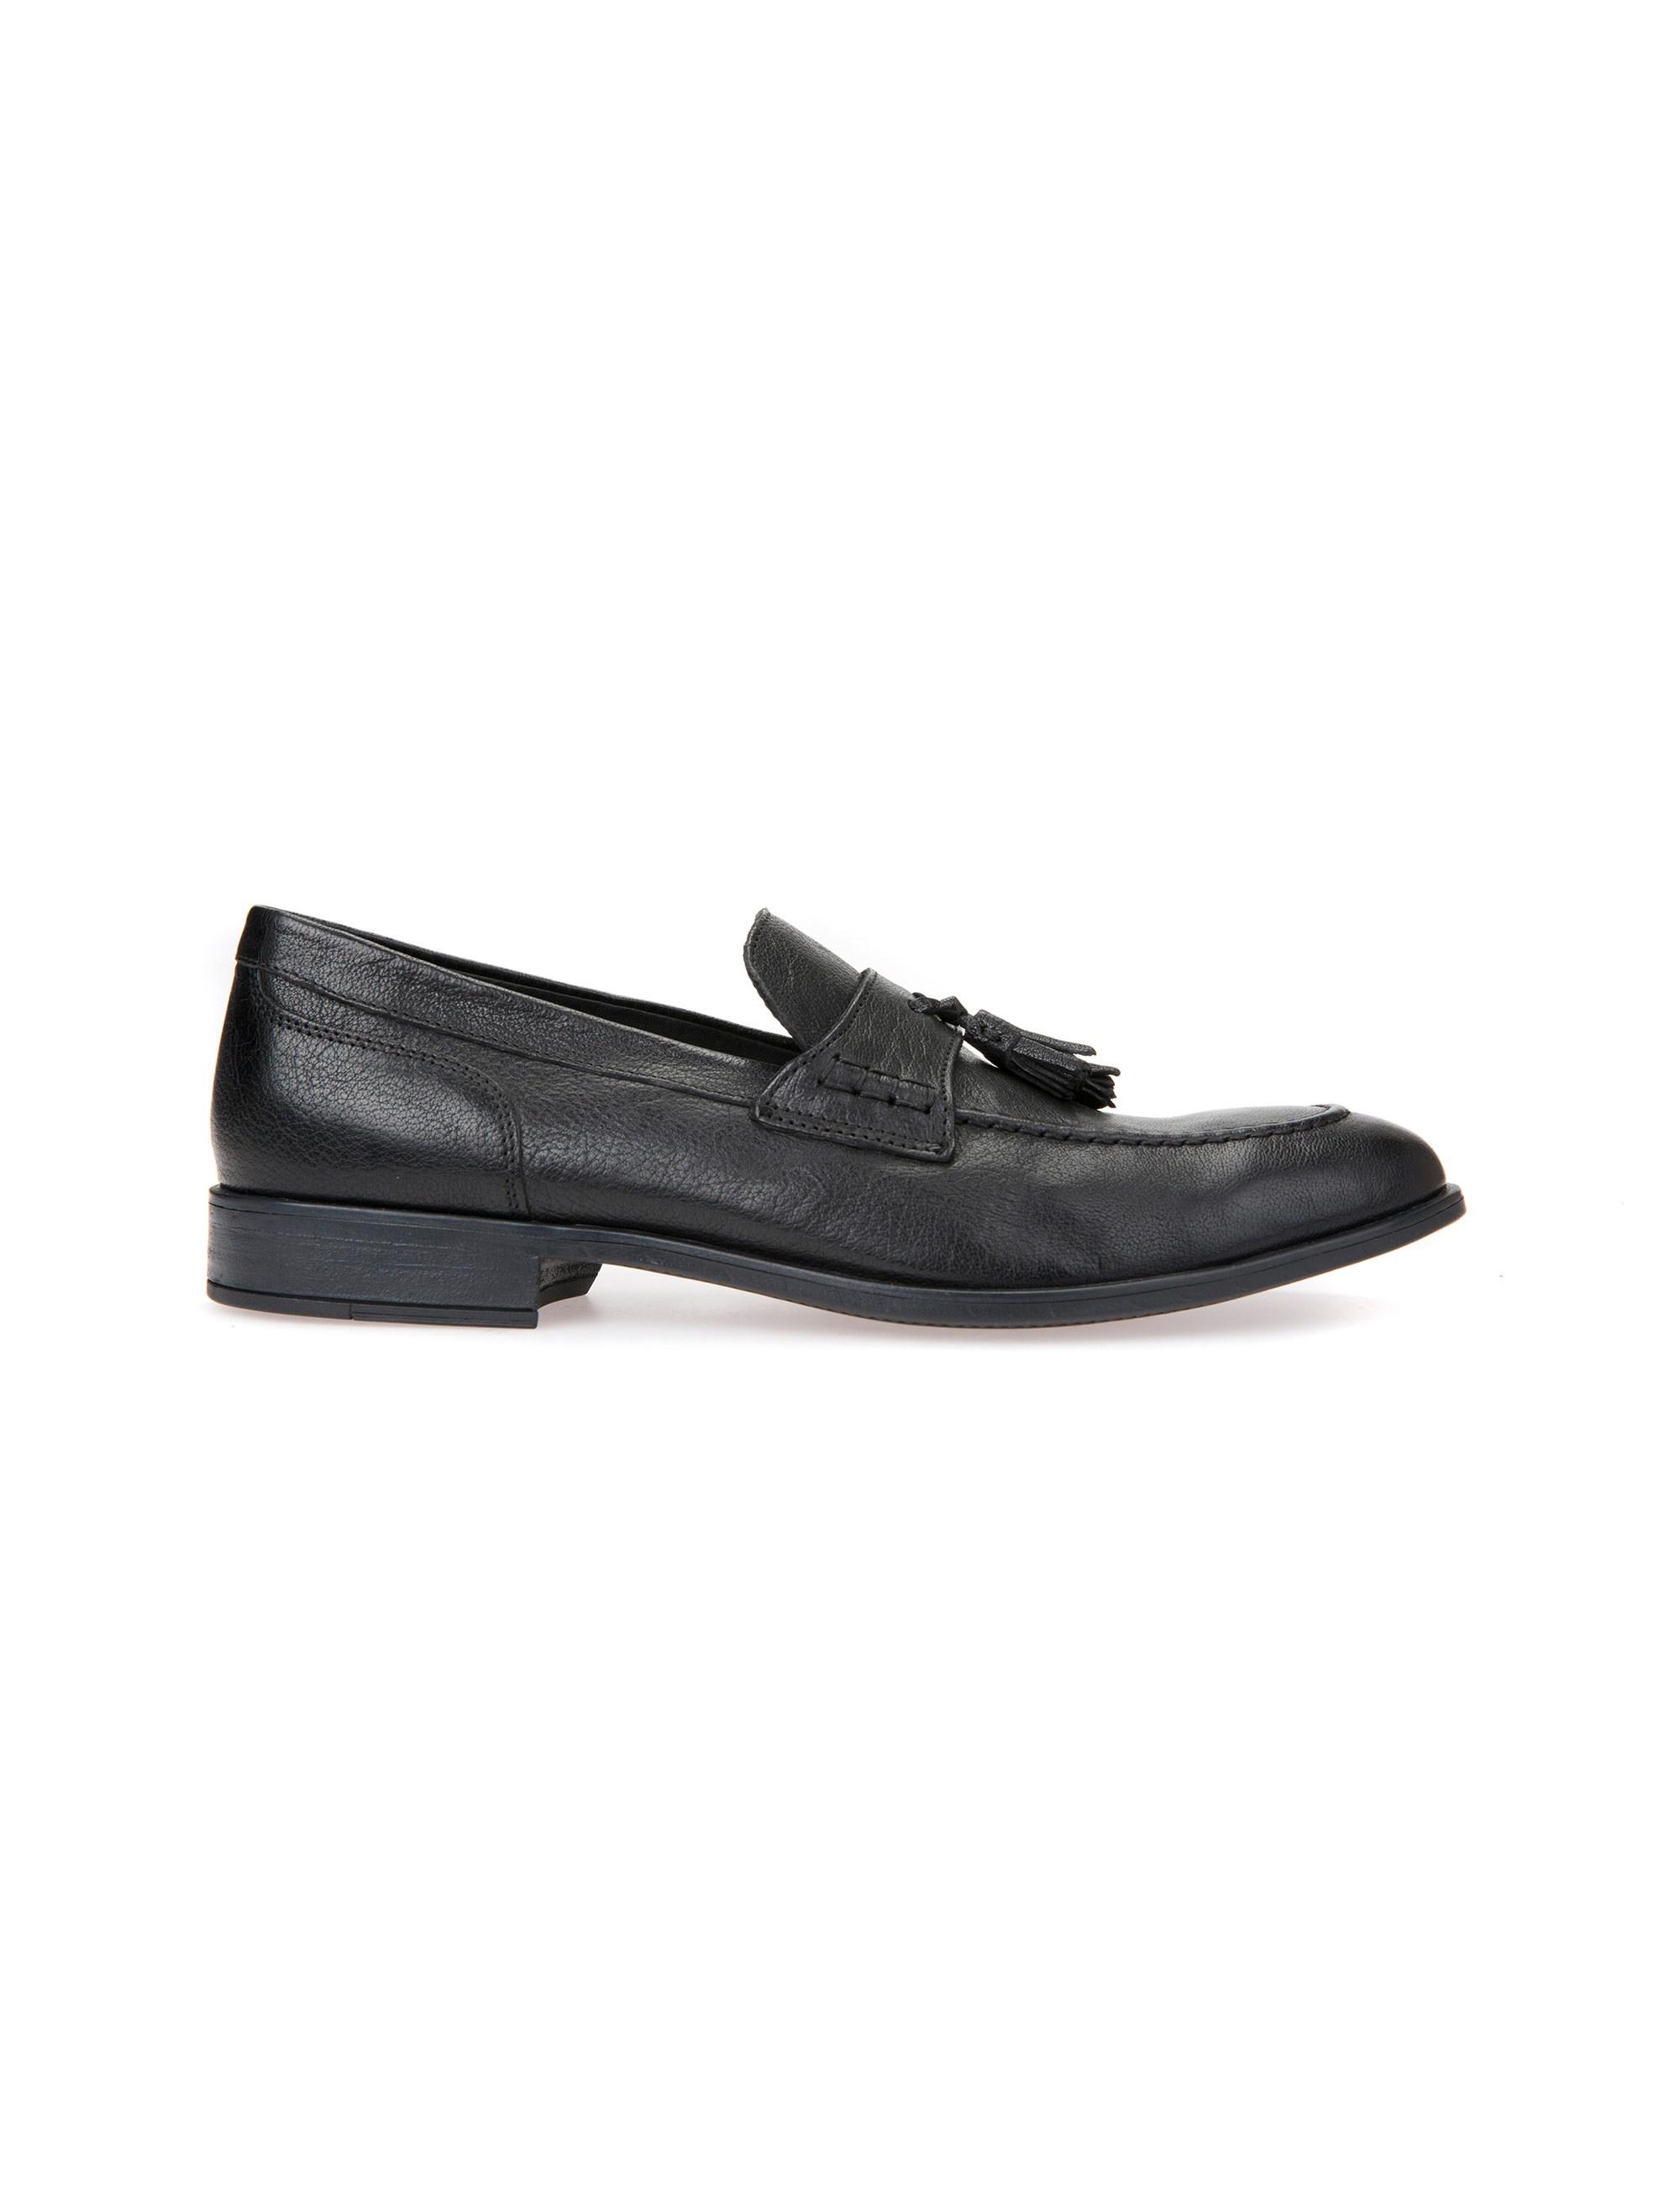 قیمت کفش راحتی چرم مردانه BRYCETON - جی اوکس